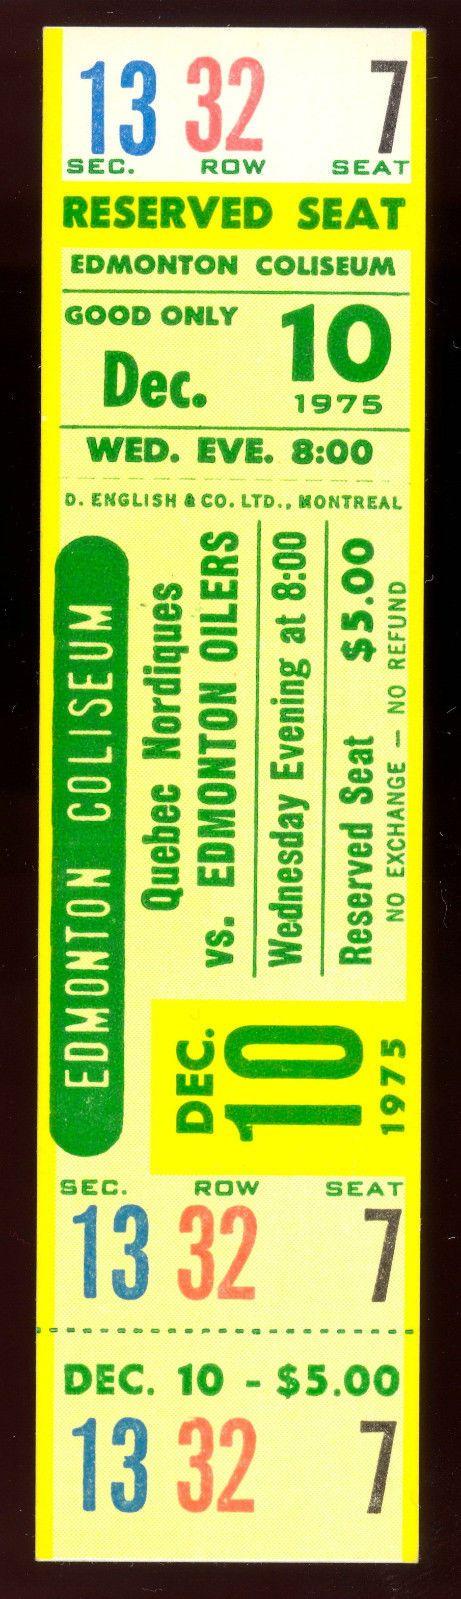 1975 dec 10 NM full ticket stub WHA HOCKEY EDMONTON OILERS VS QUEBEC NORDIQUES | eBay